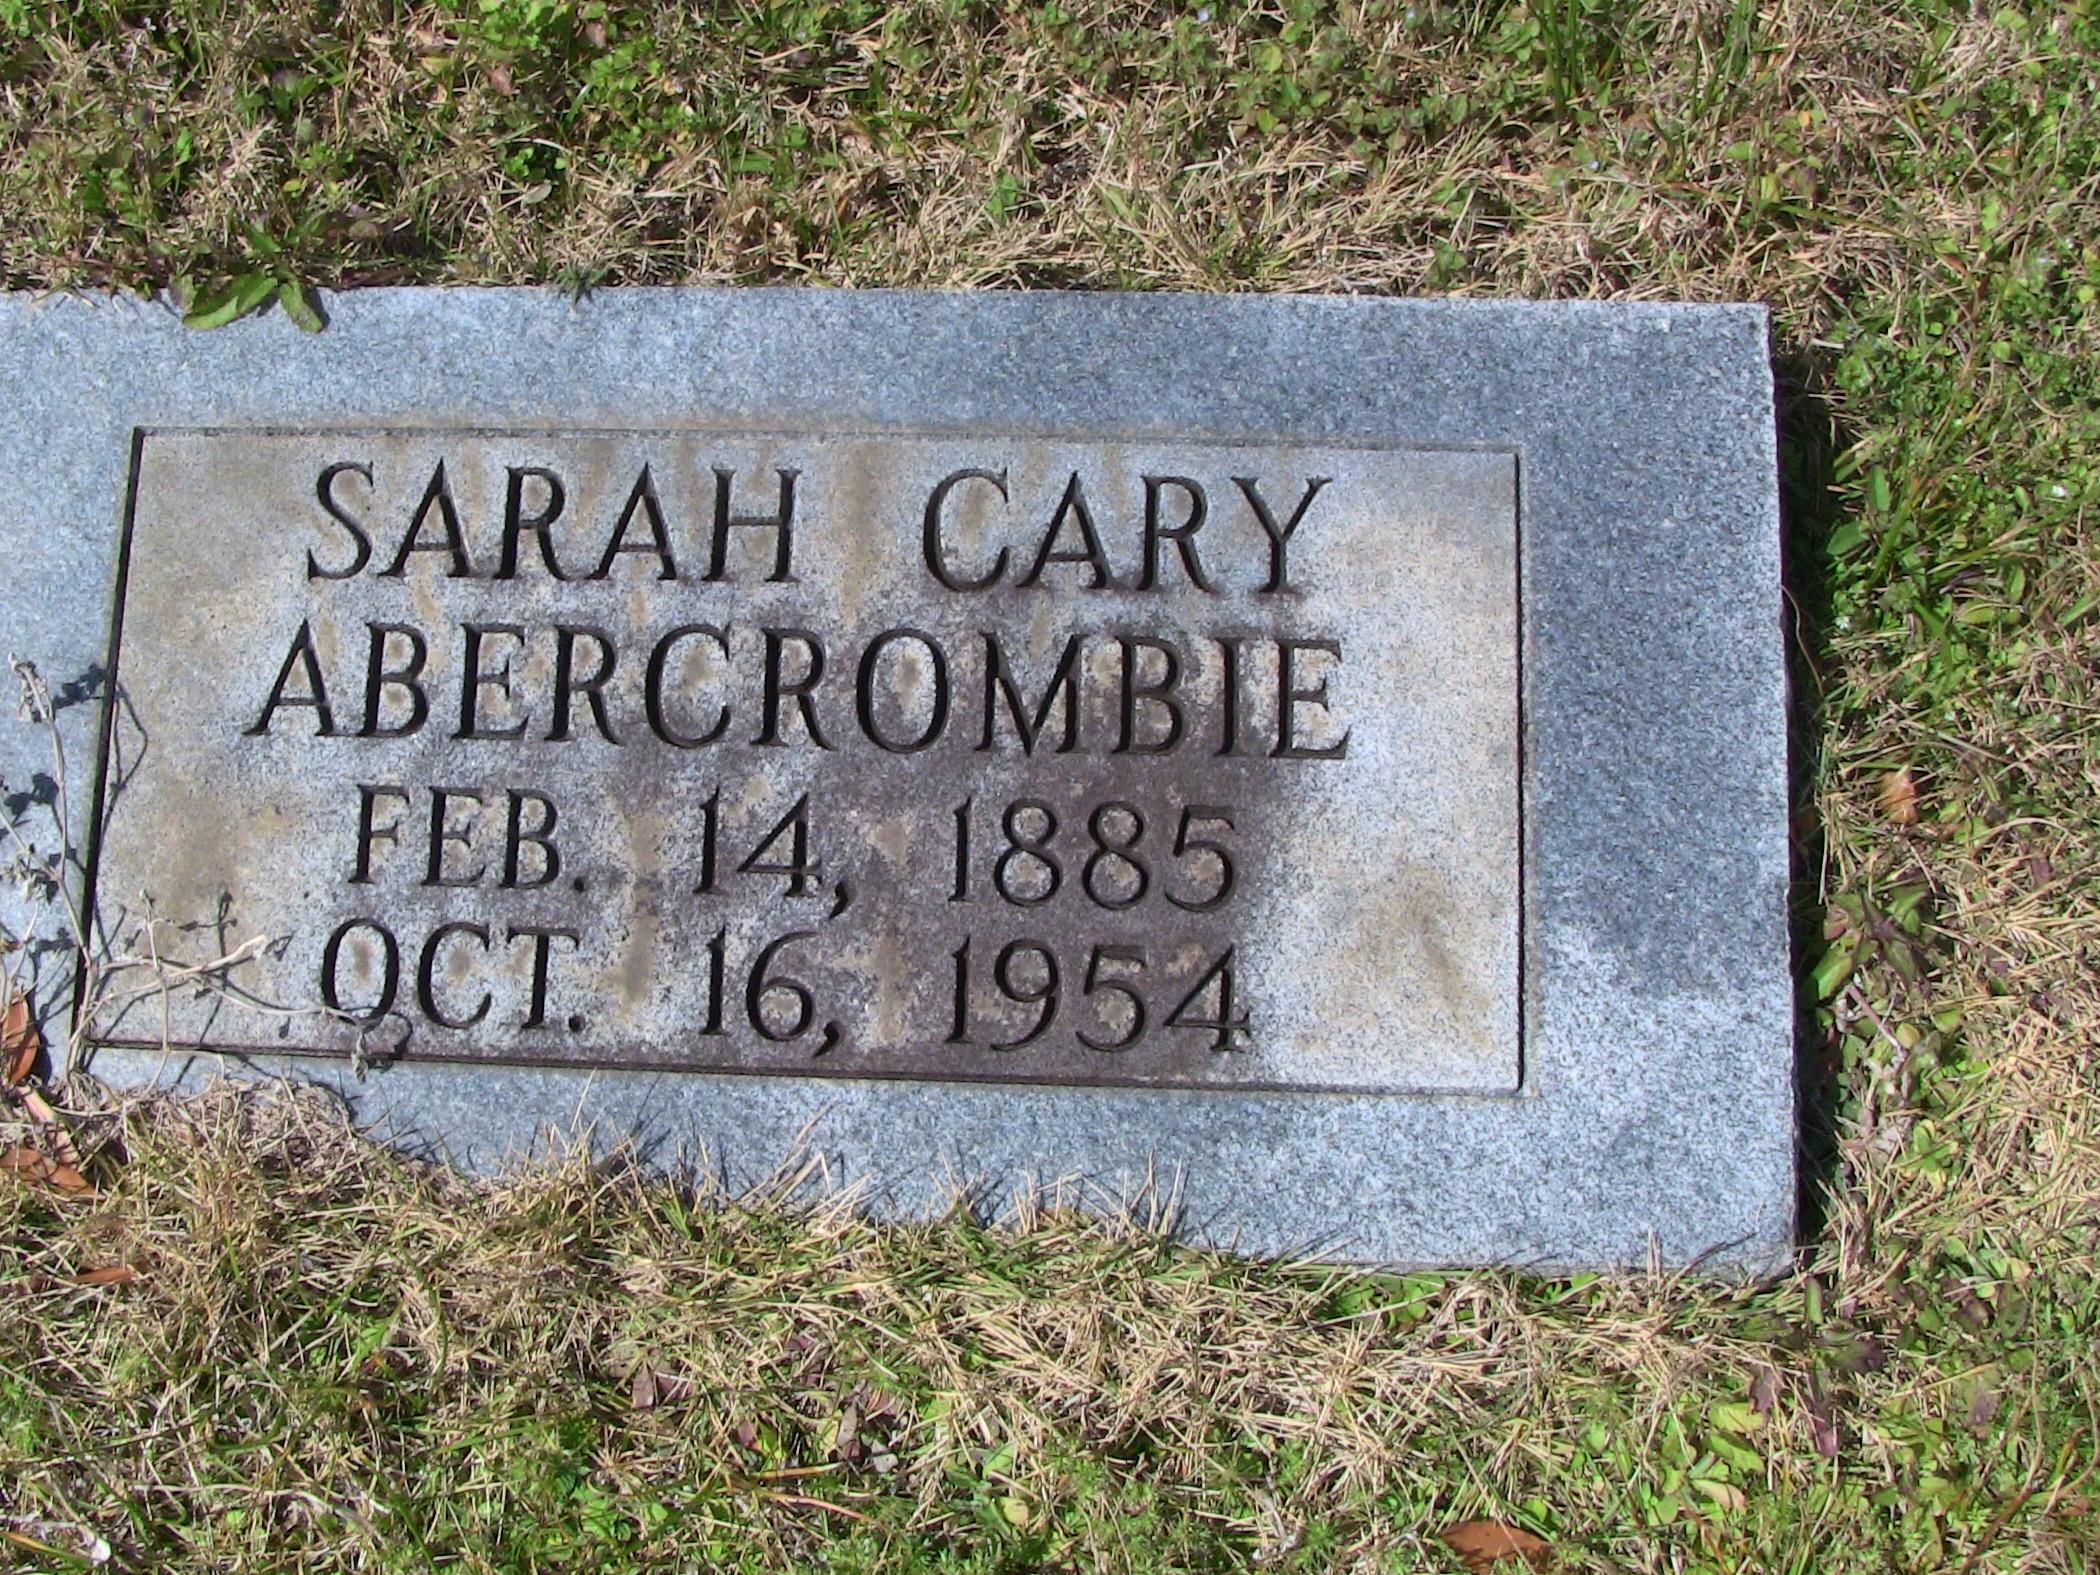 Sarah Cary Abercrombie